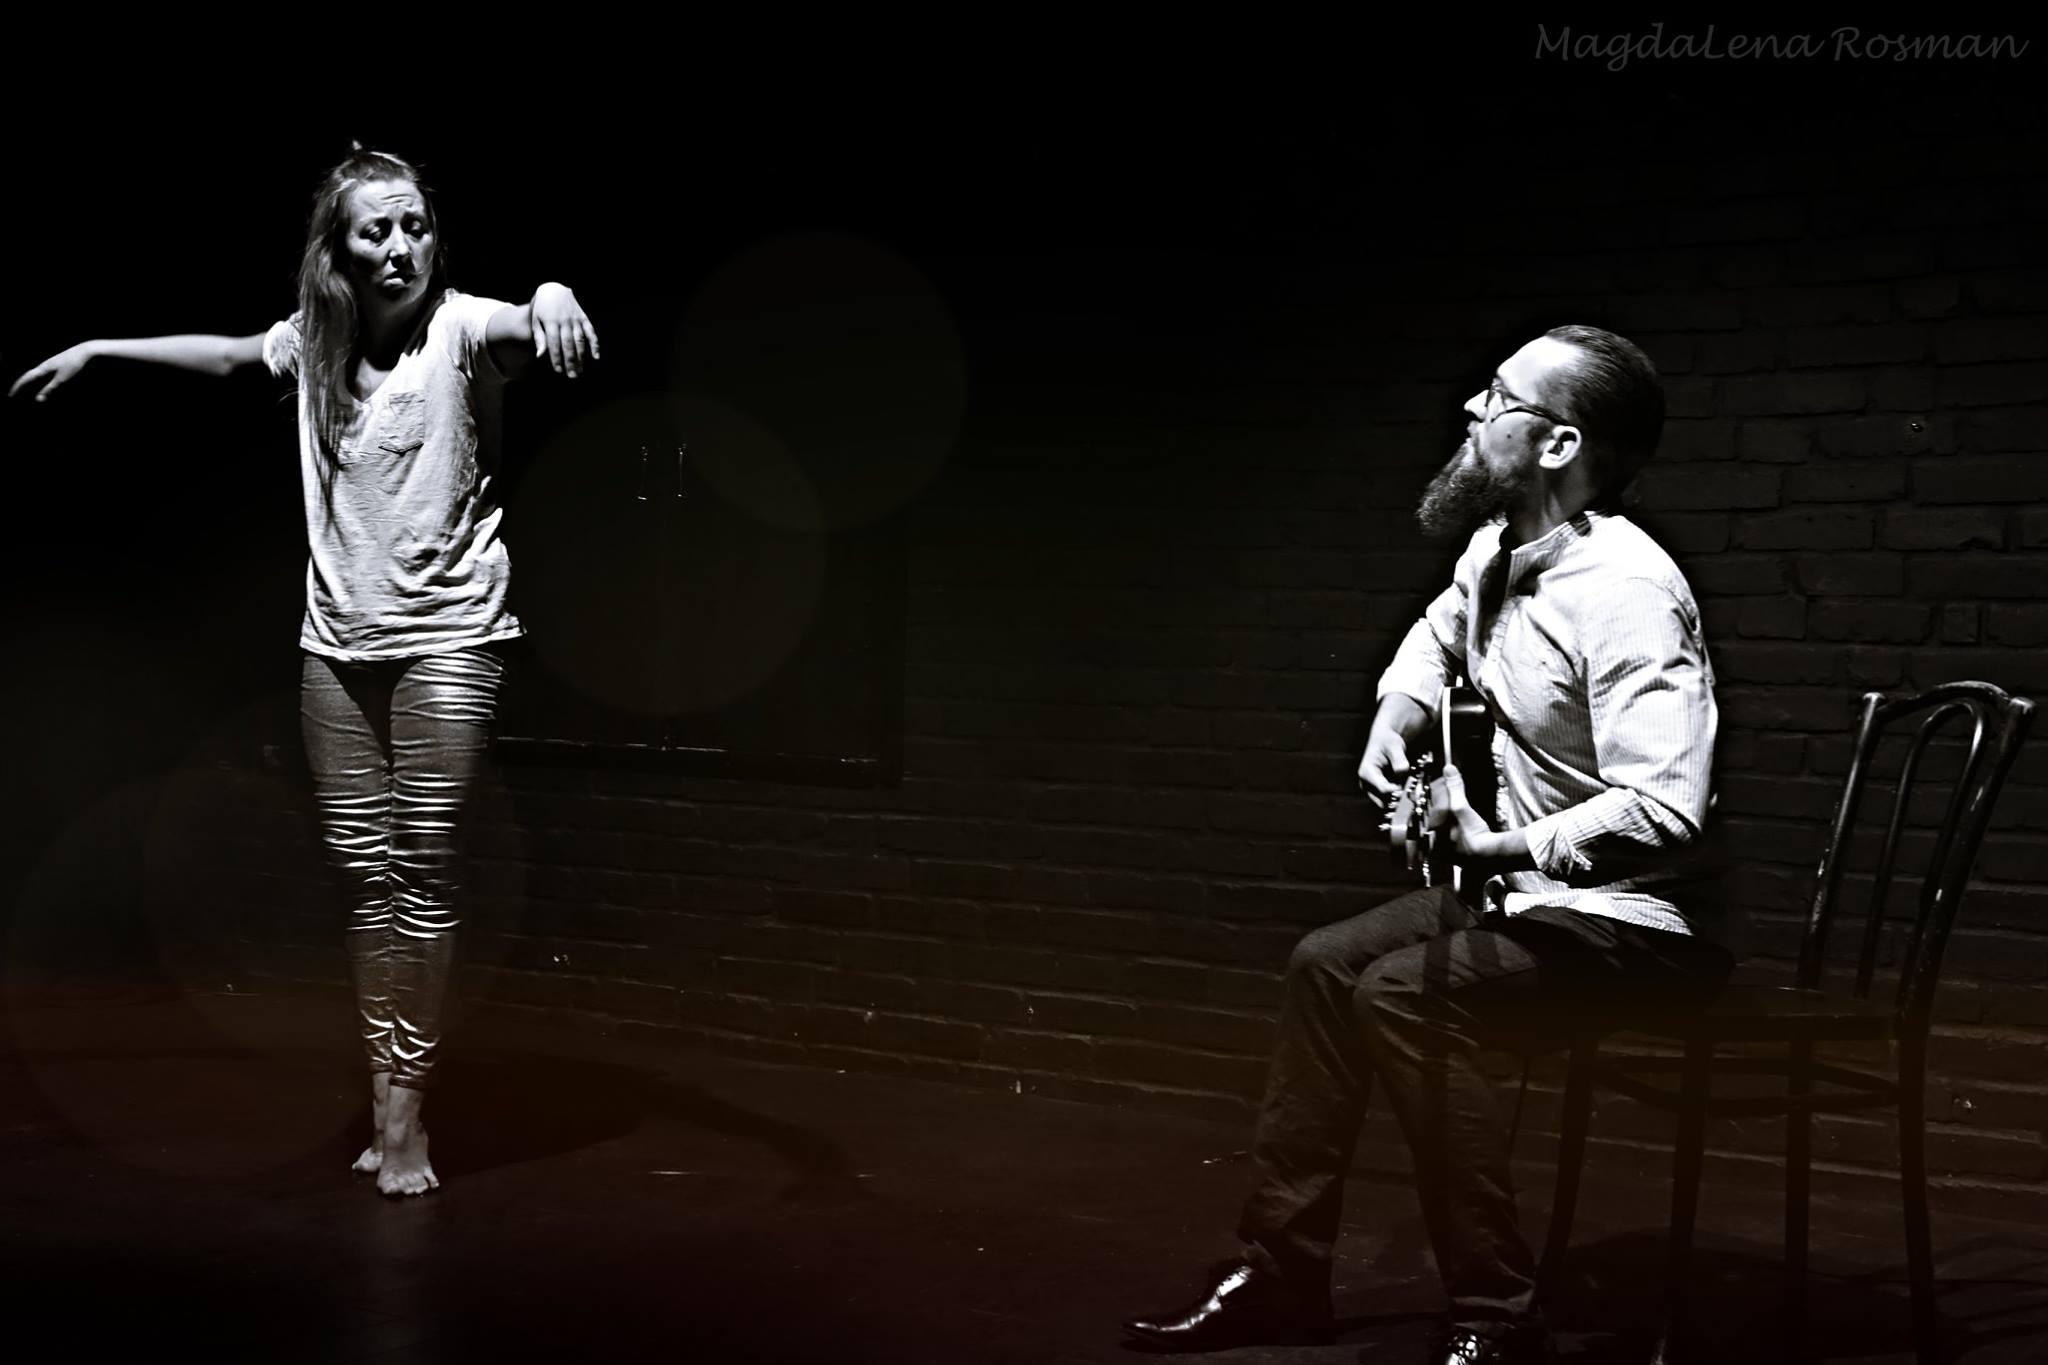 Double Trouble / duet muzyczno-ruchowy